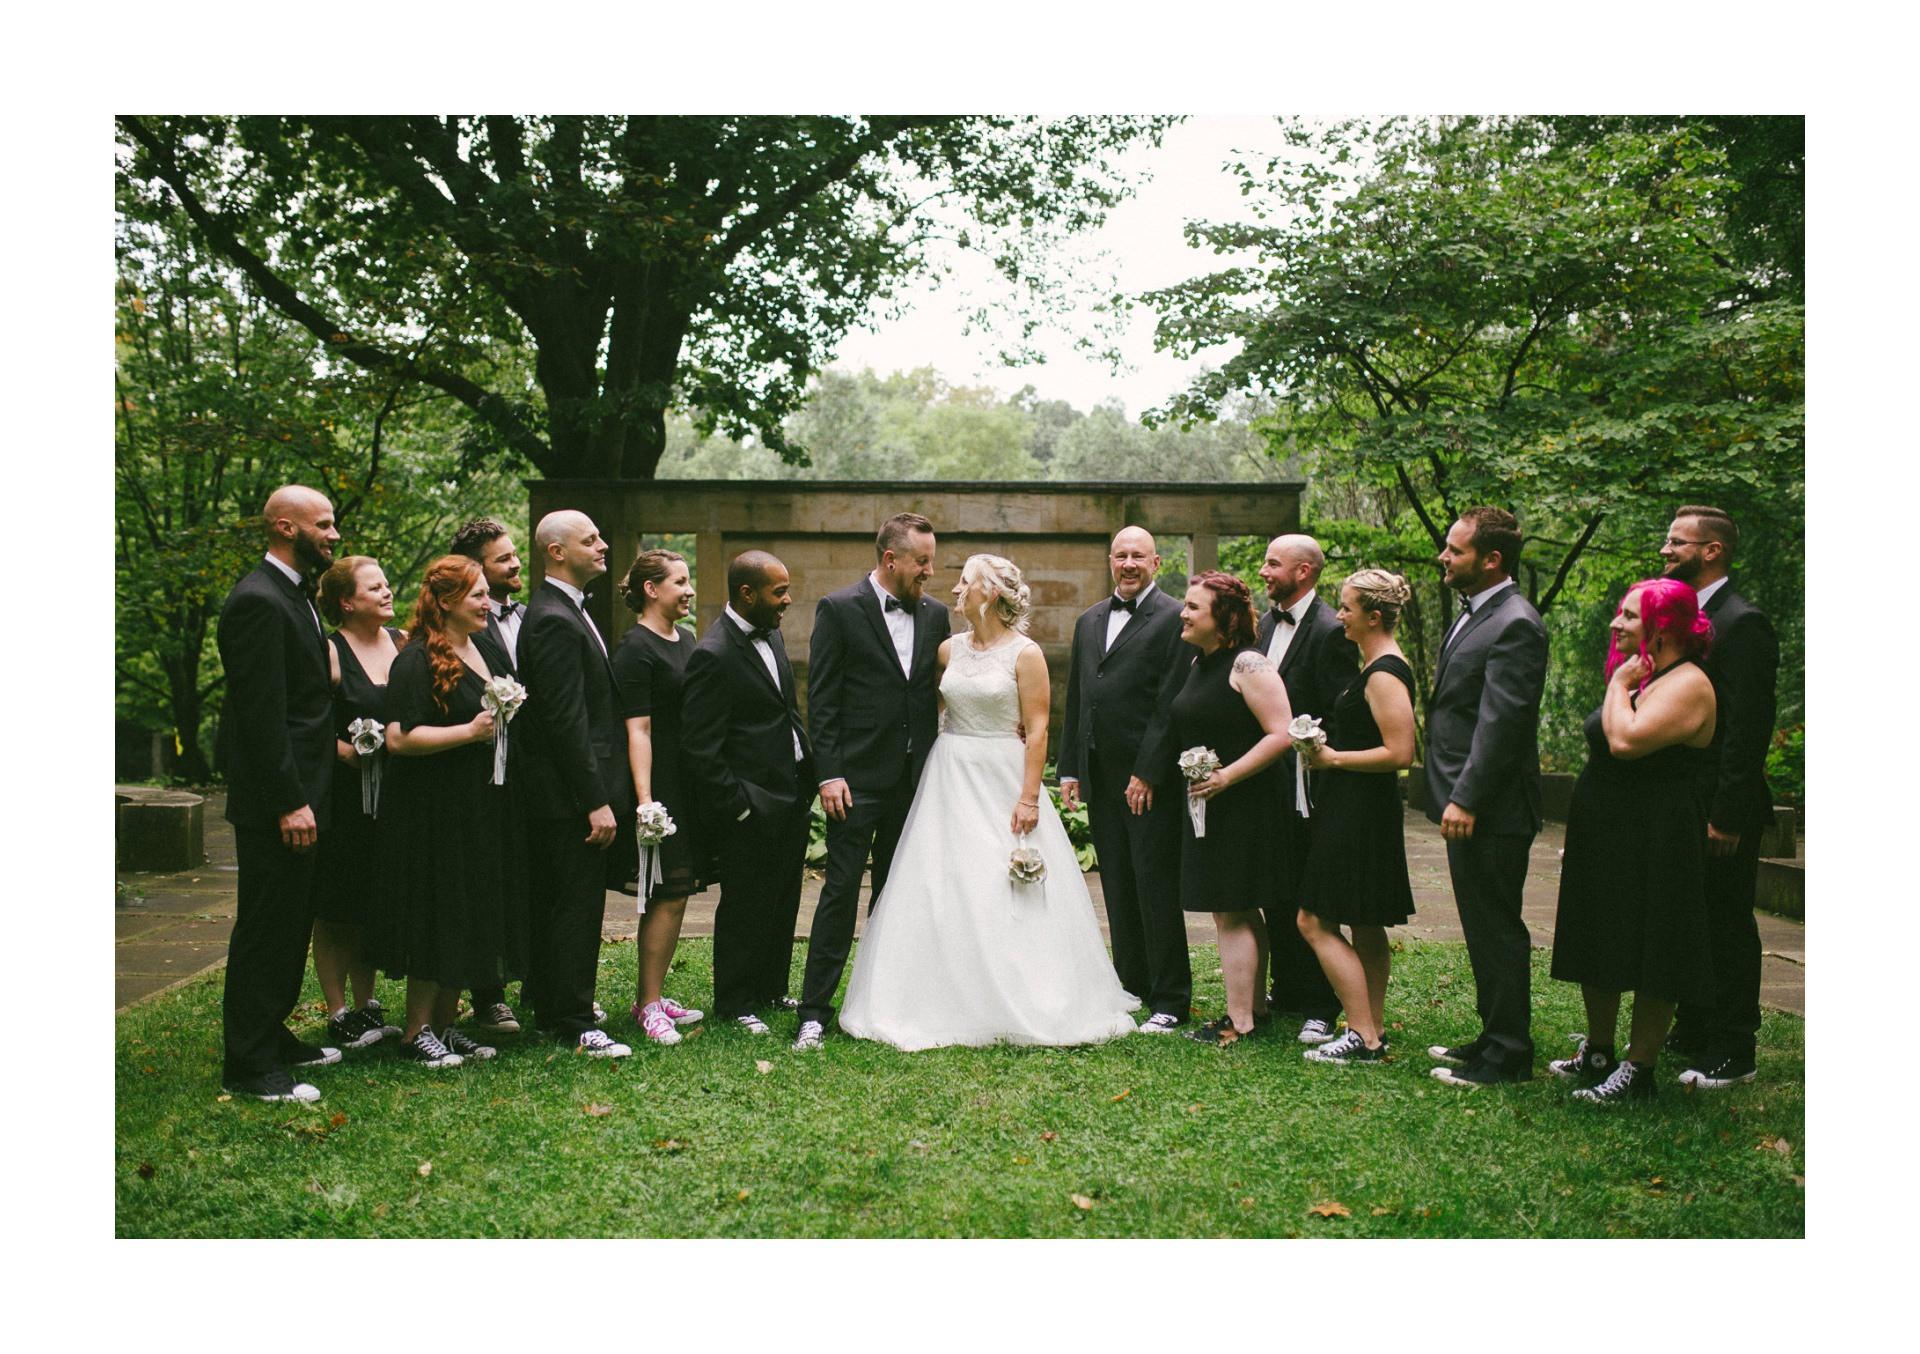 Goldhorn Brewery Wedding Photos in Cleveland 1 40.jpg